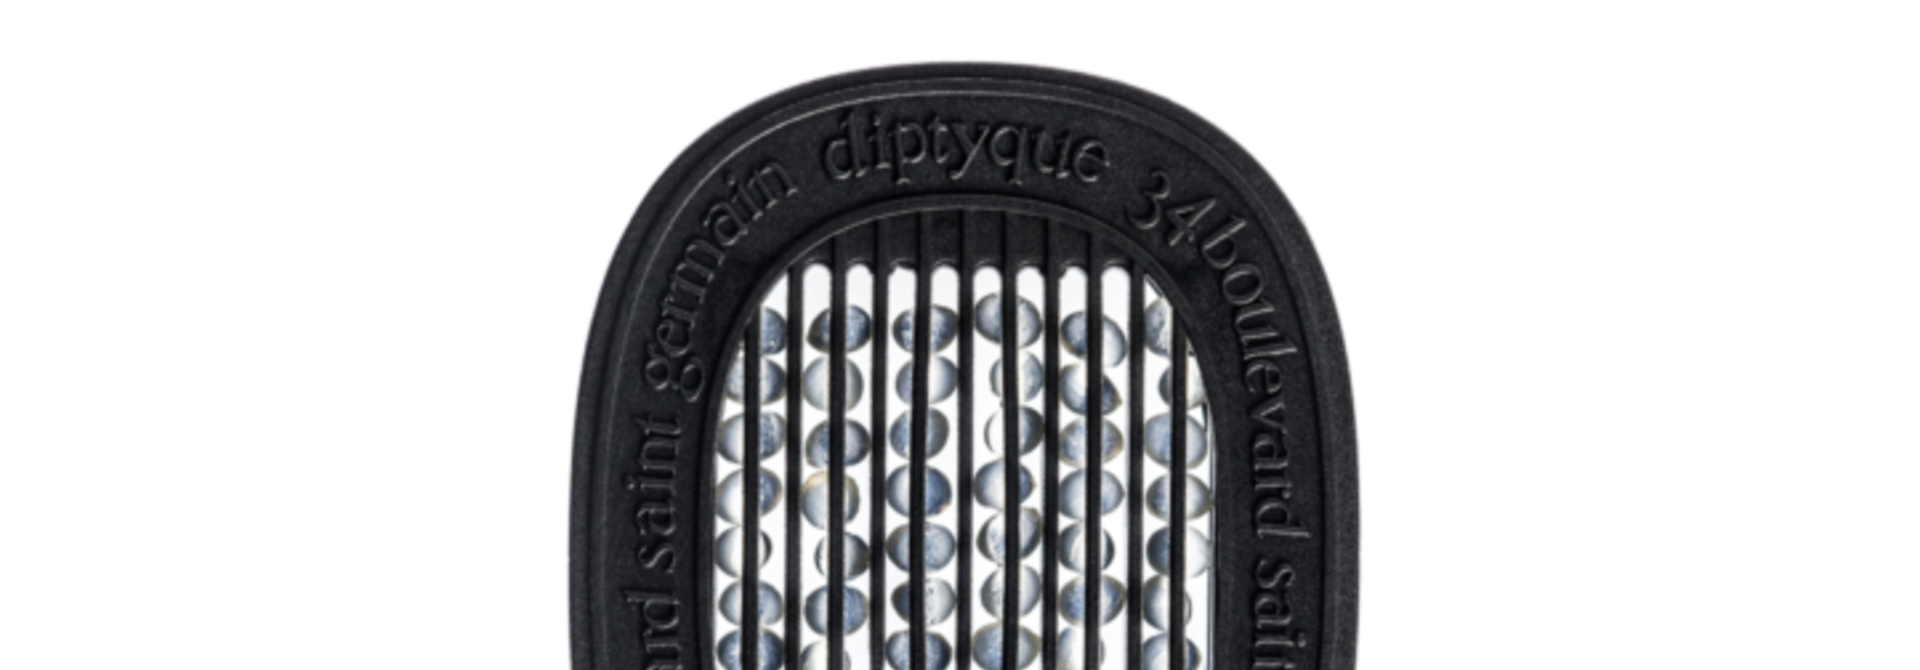 DIPTYQUE - Mimosa Diffuser Capsule Refill